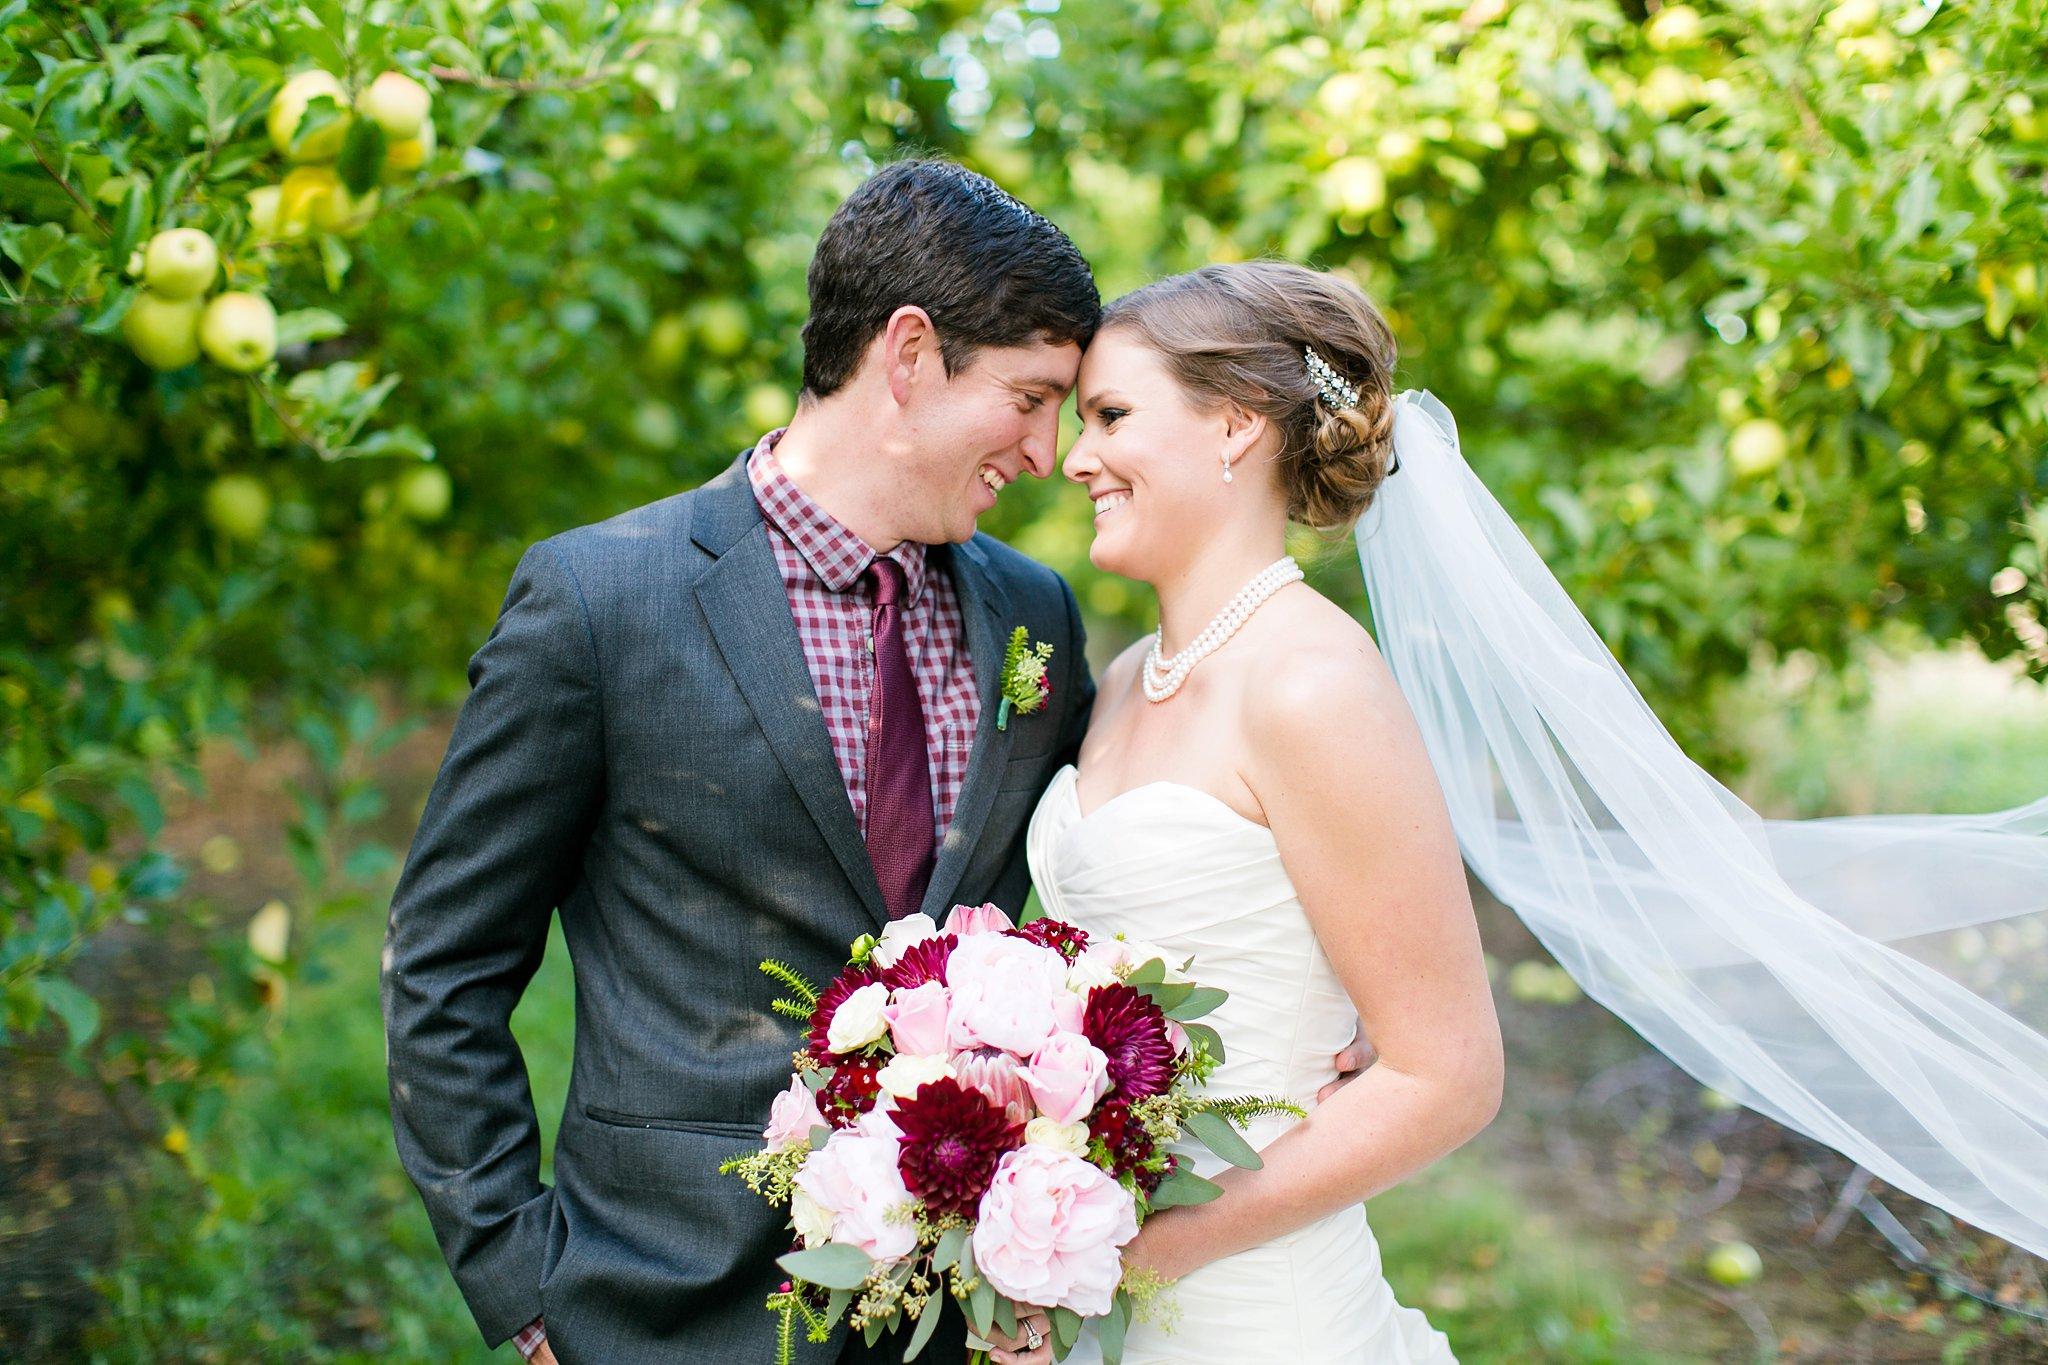 Chelan Washington Wedding Photos Megan Kelsey Photography Delight Wedding Workshop Styled Shoot Annalee & Scot-120.jpg